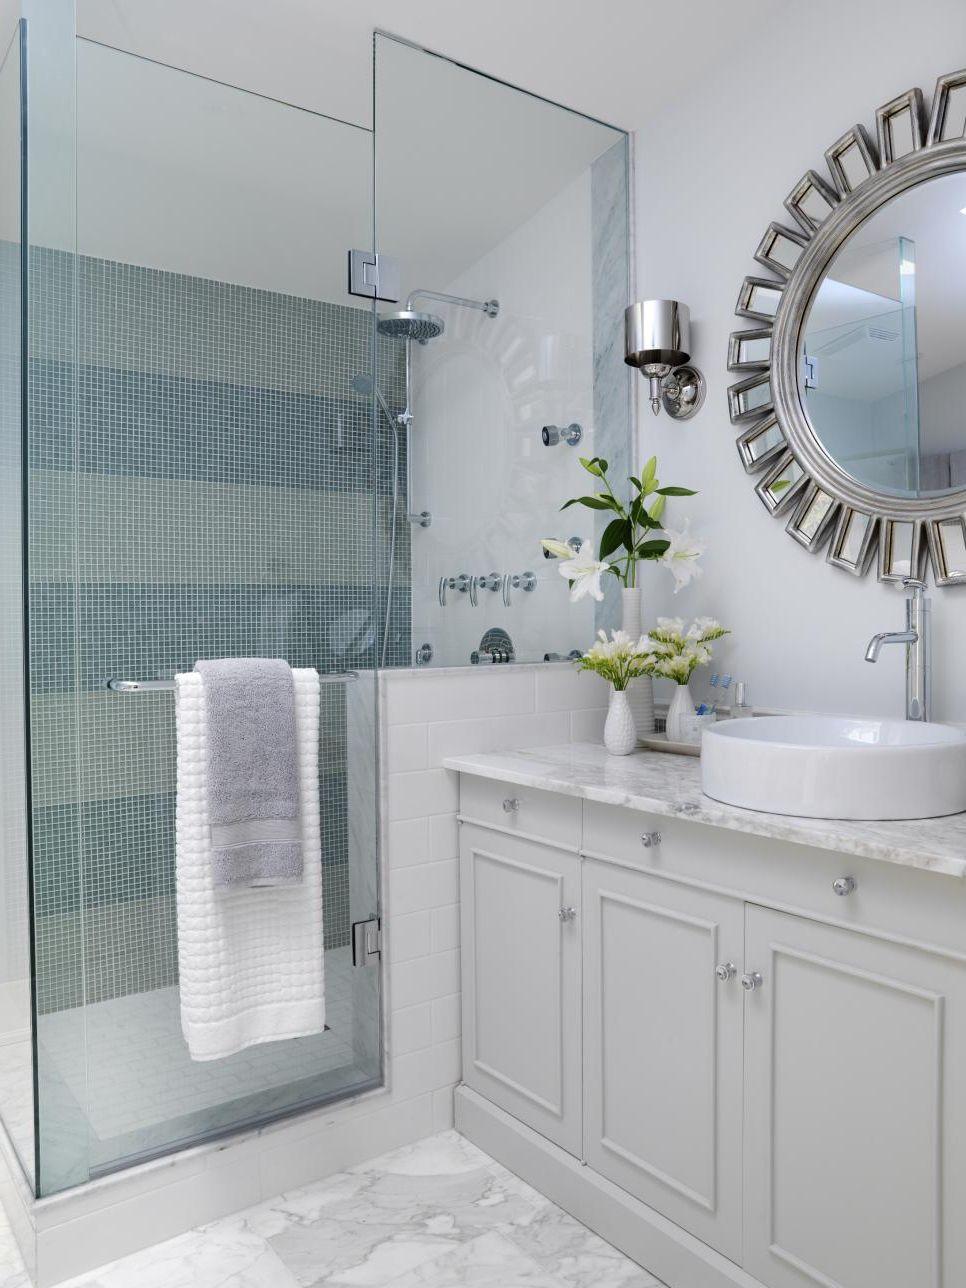 Small Bathroom Tile Ideas Pictures - Get Ideas   Bathroom ...